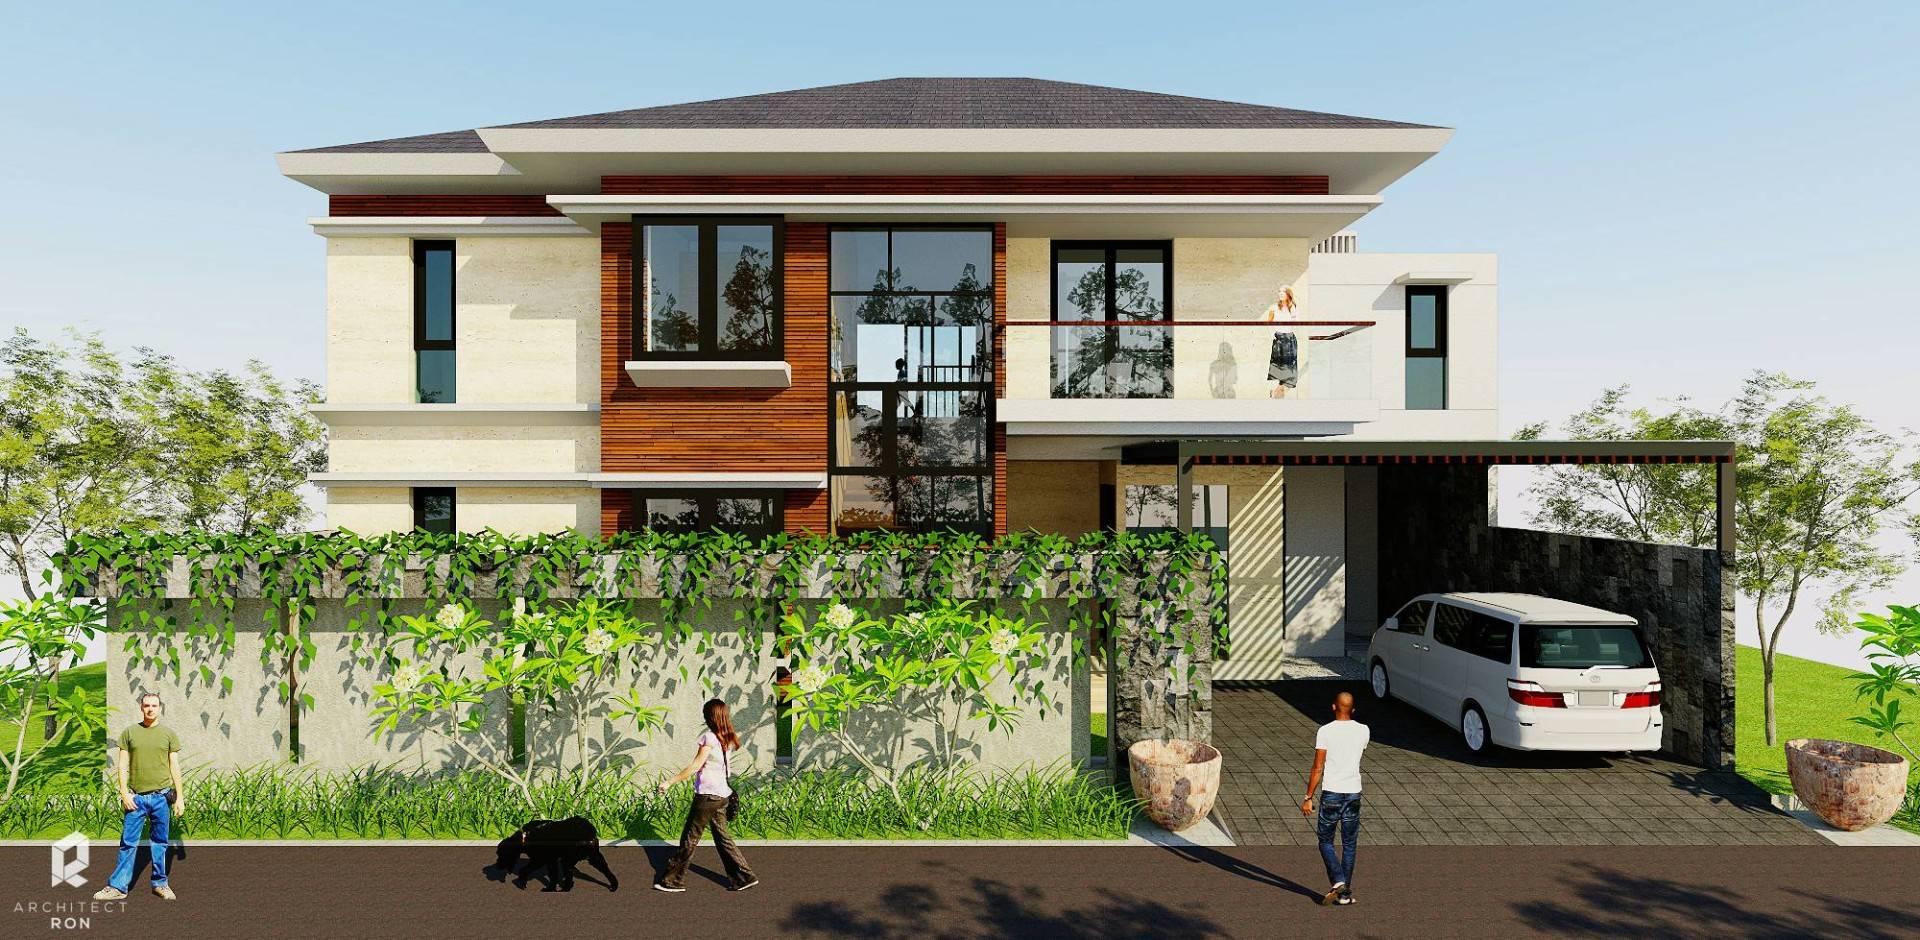 Architectron Dp House At Pekalongan Middle Java Middle Java Facade   2044